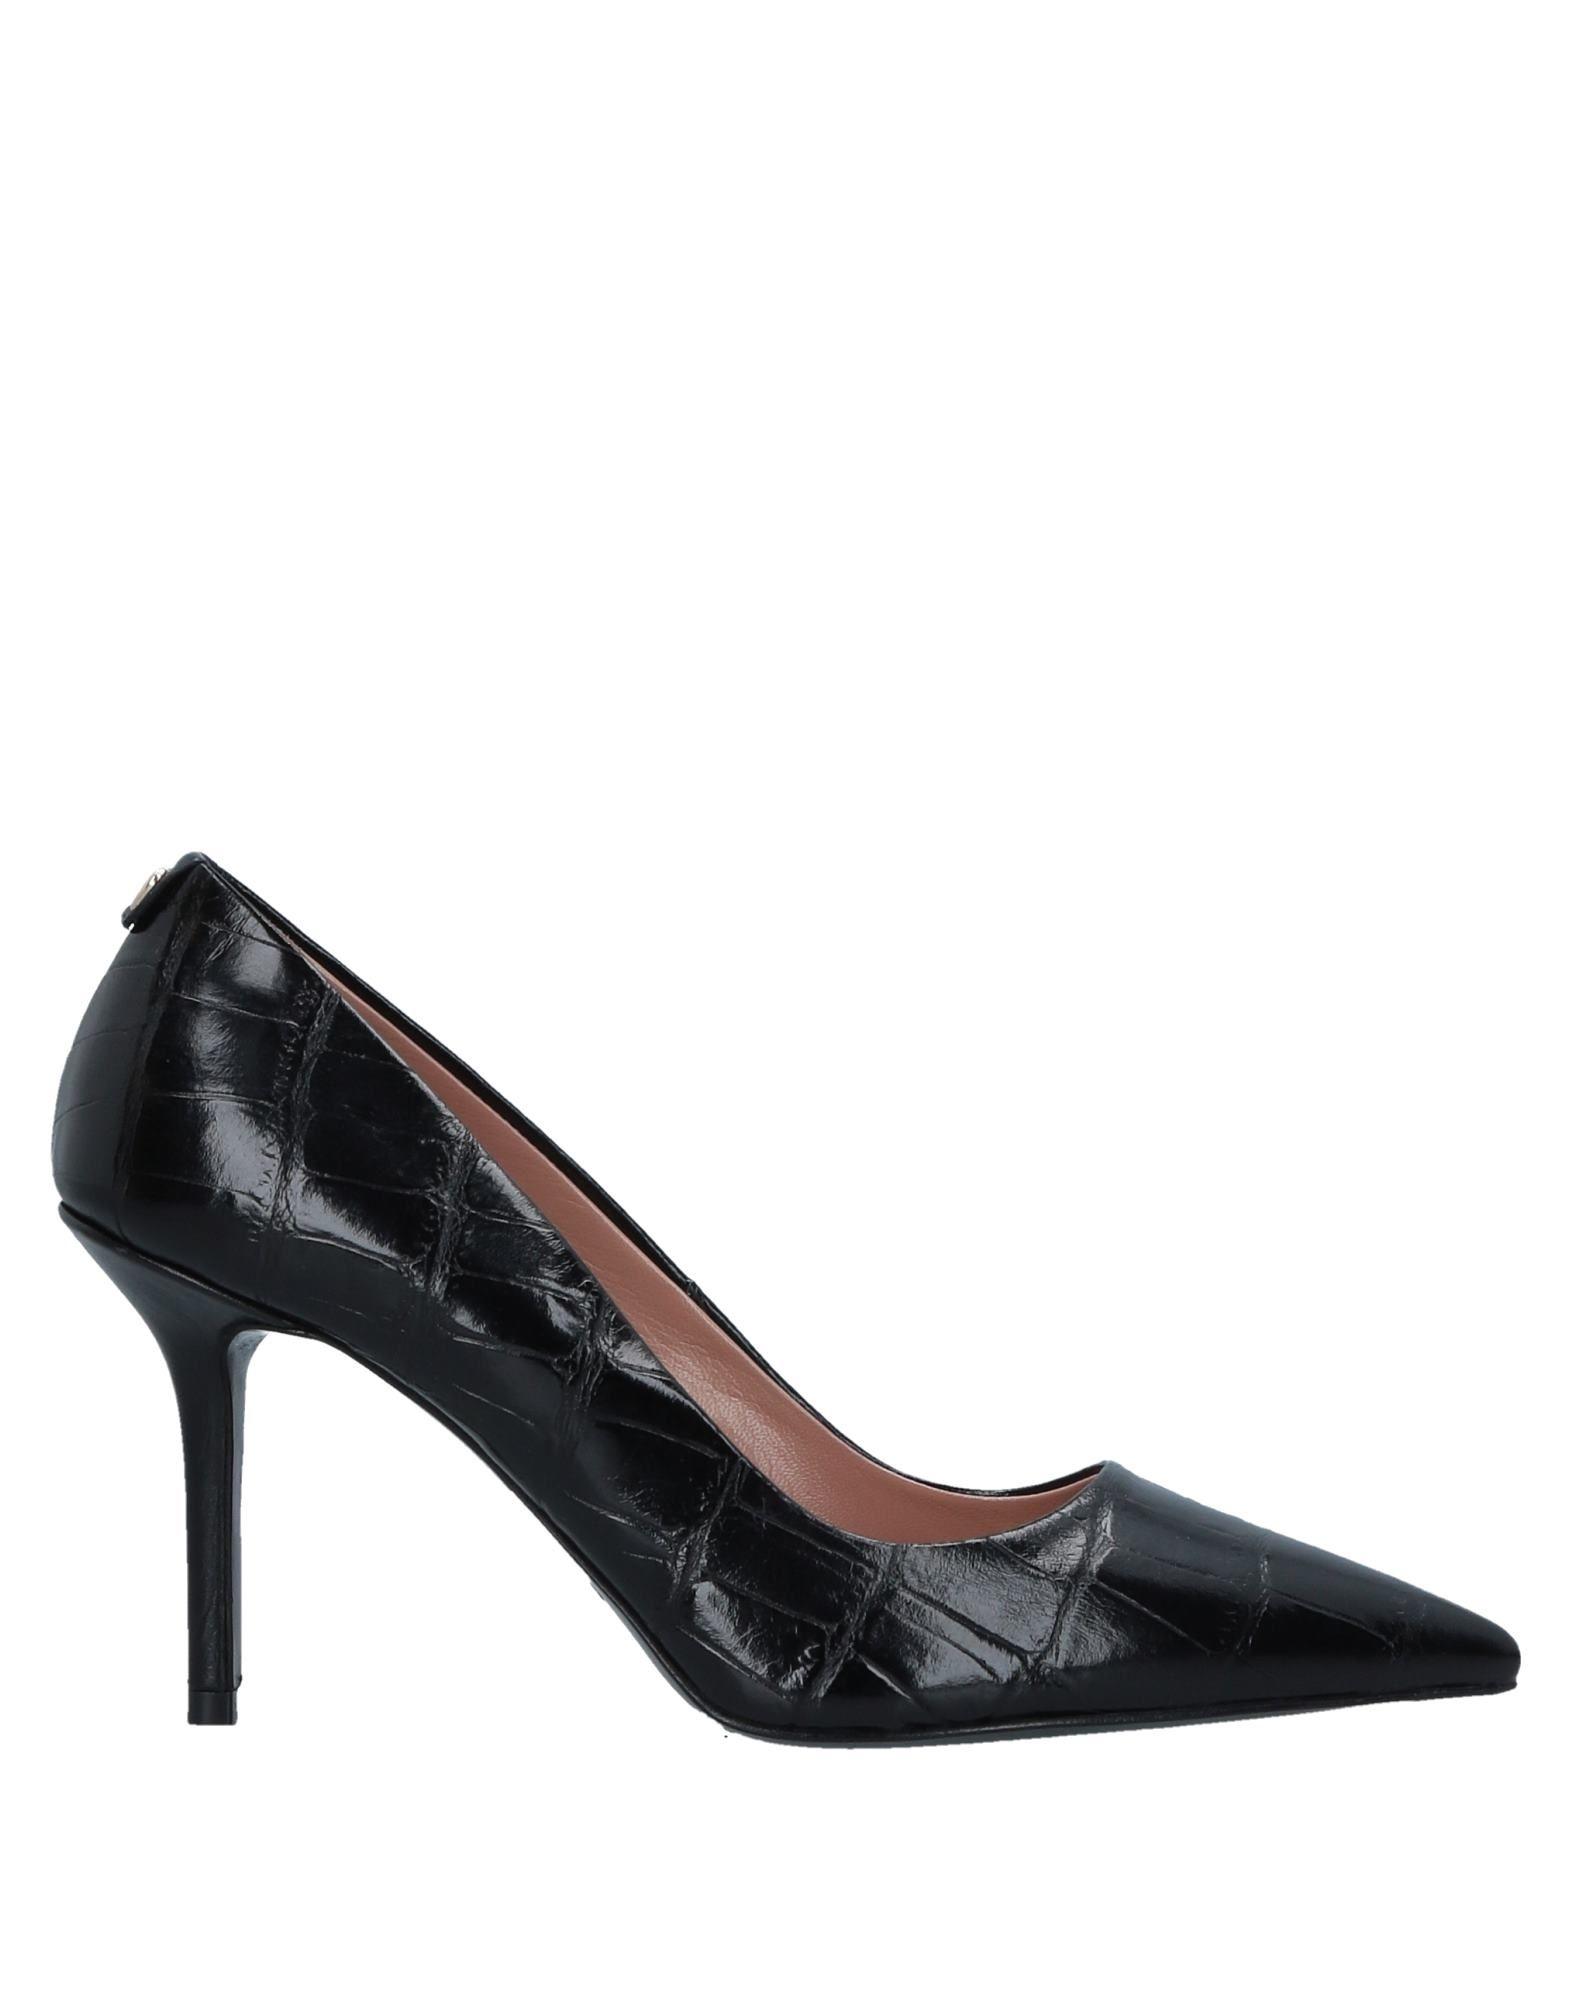 Haltbare Mode billige Schuhe Twin 11529708EW Beliebte Schuhe